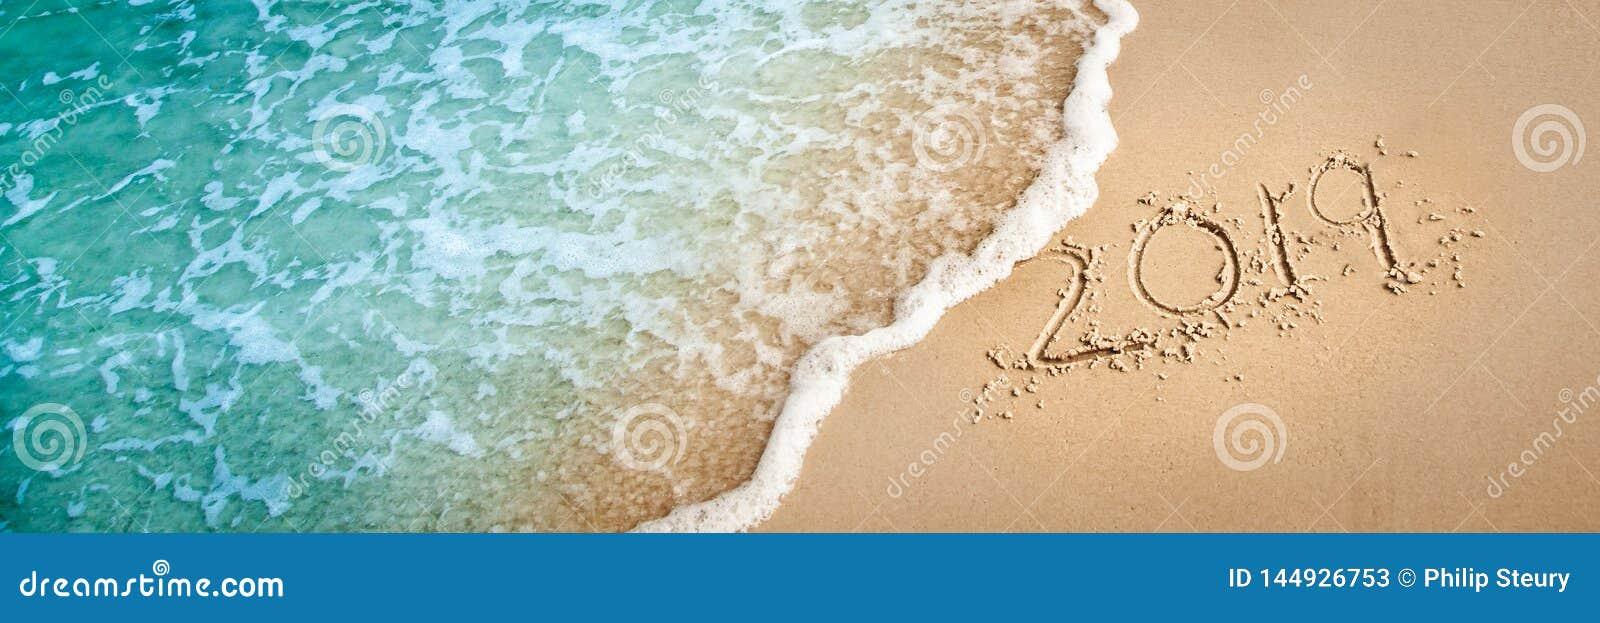 2019 en la playa